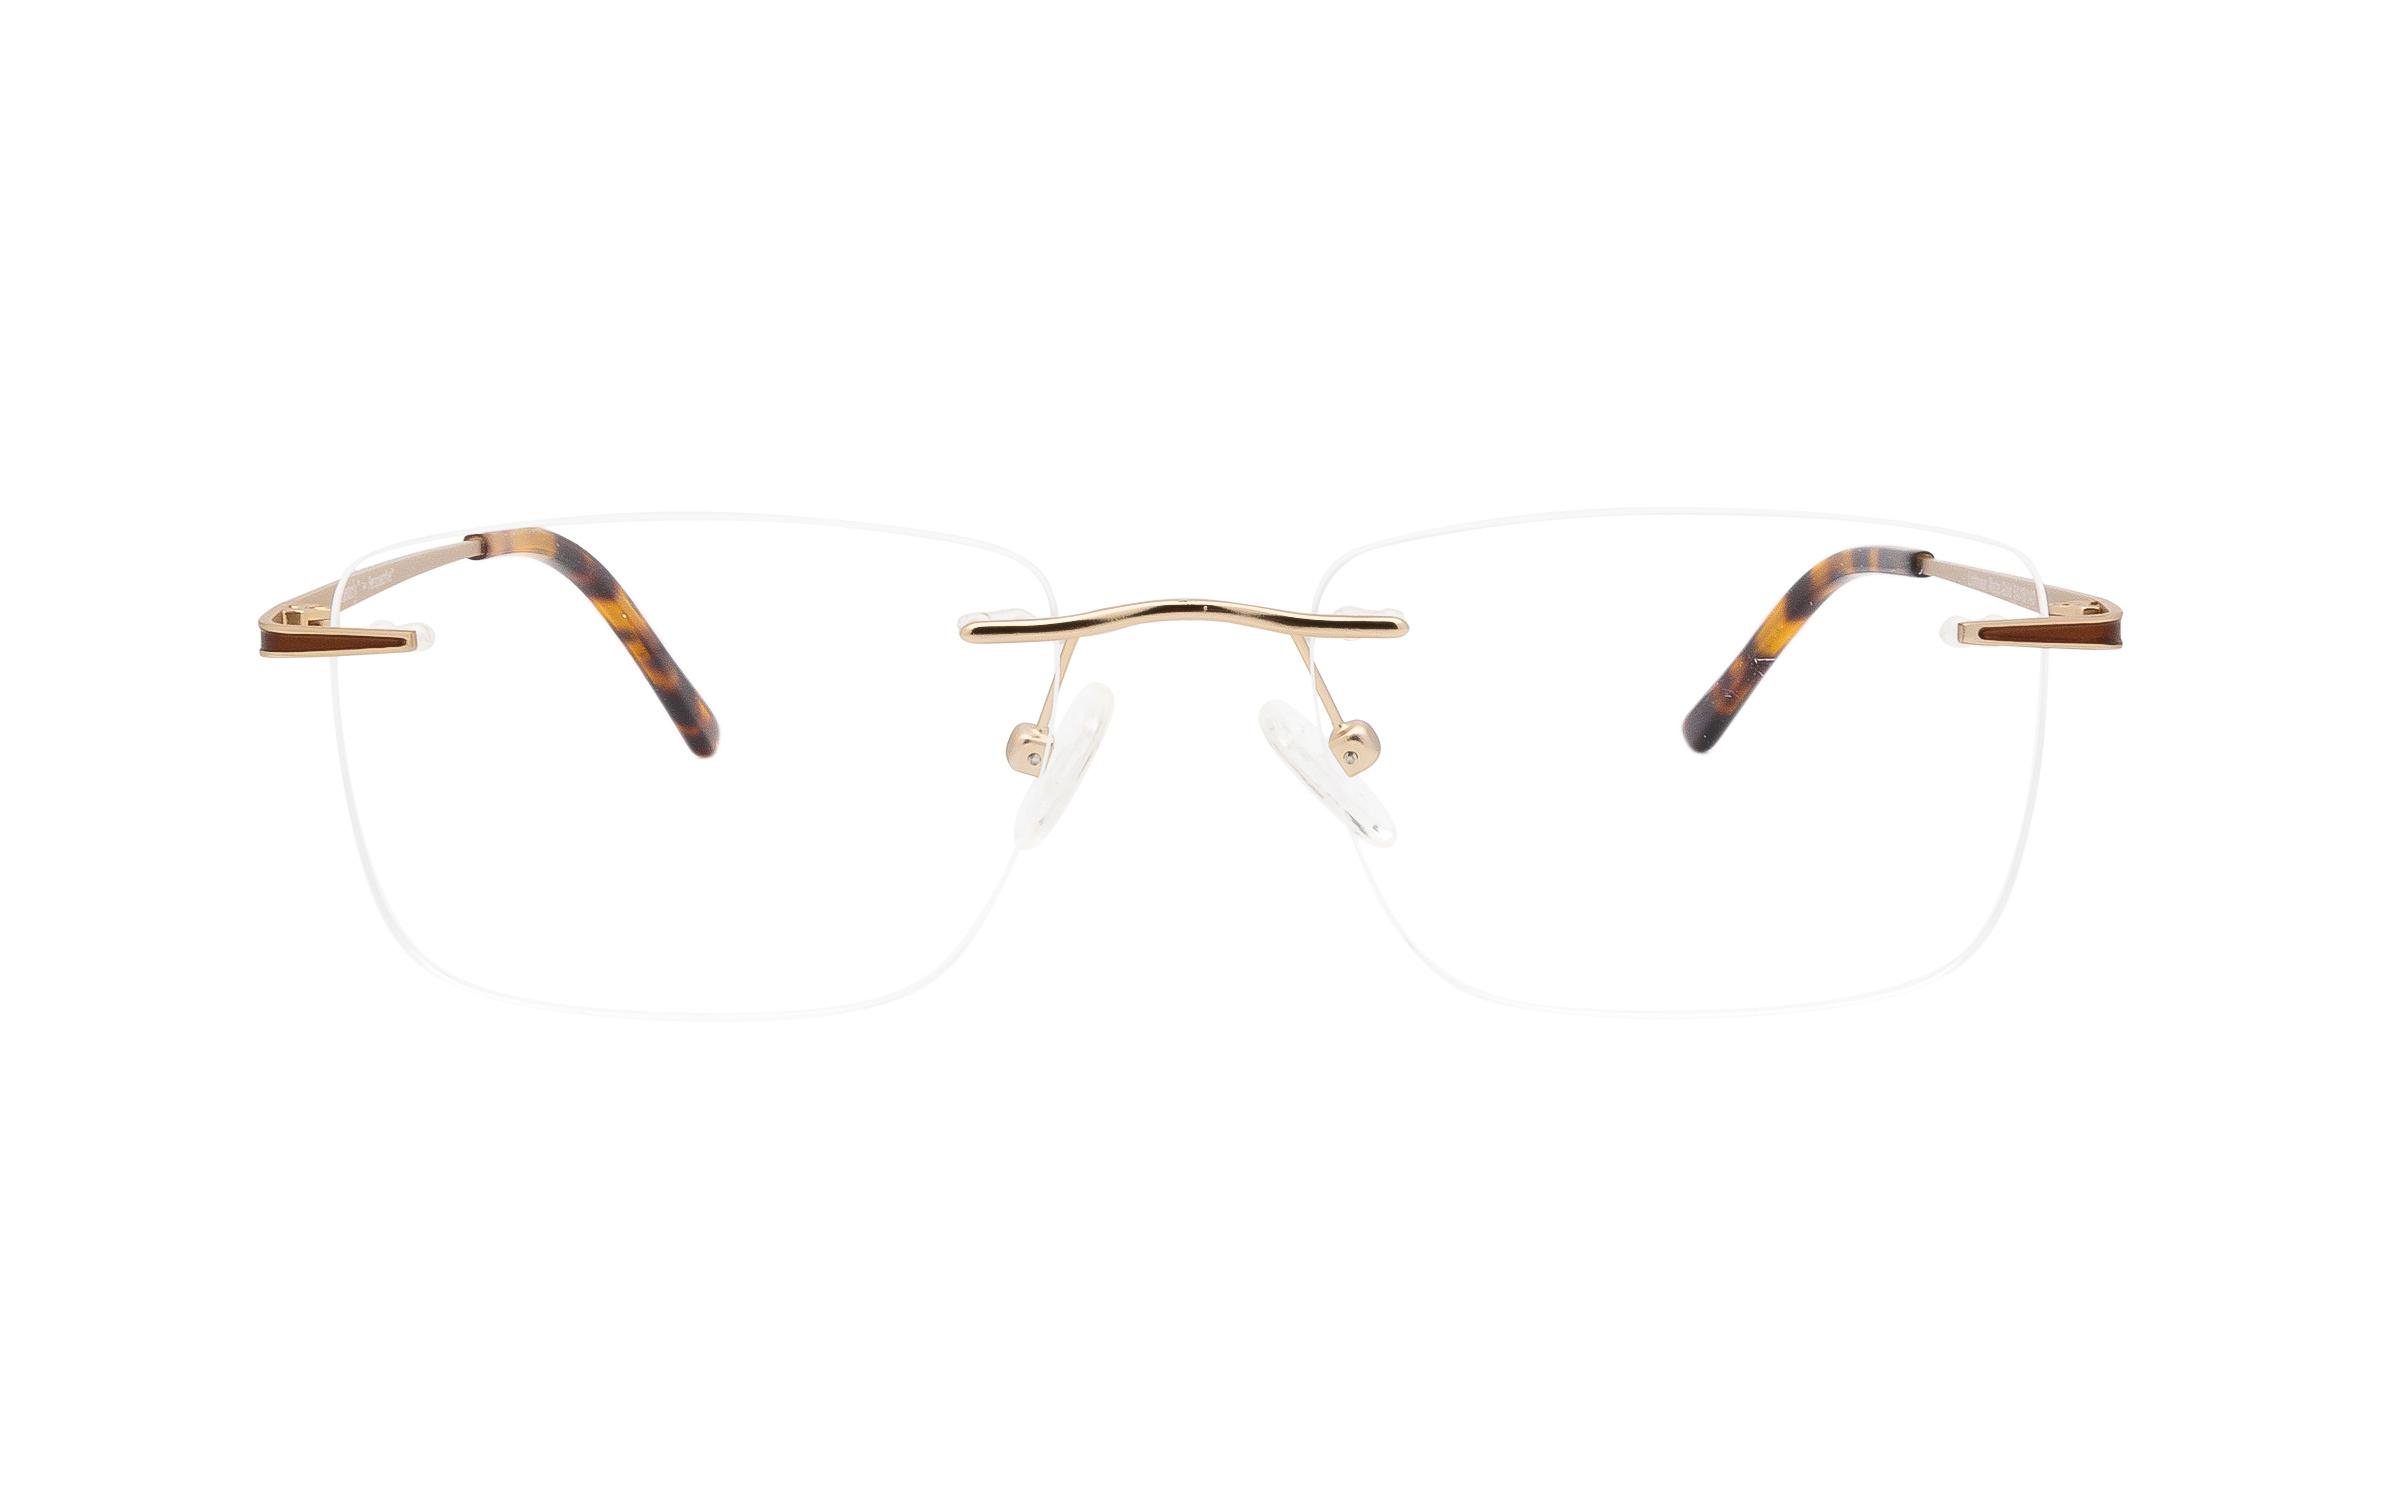 http://www.coastal.com/ - Perspective Lightyear PER016 C04 (54) Eyeglasses and Frame in Matte Gold | Metal – Online Coastal